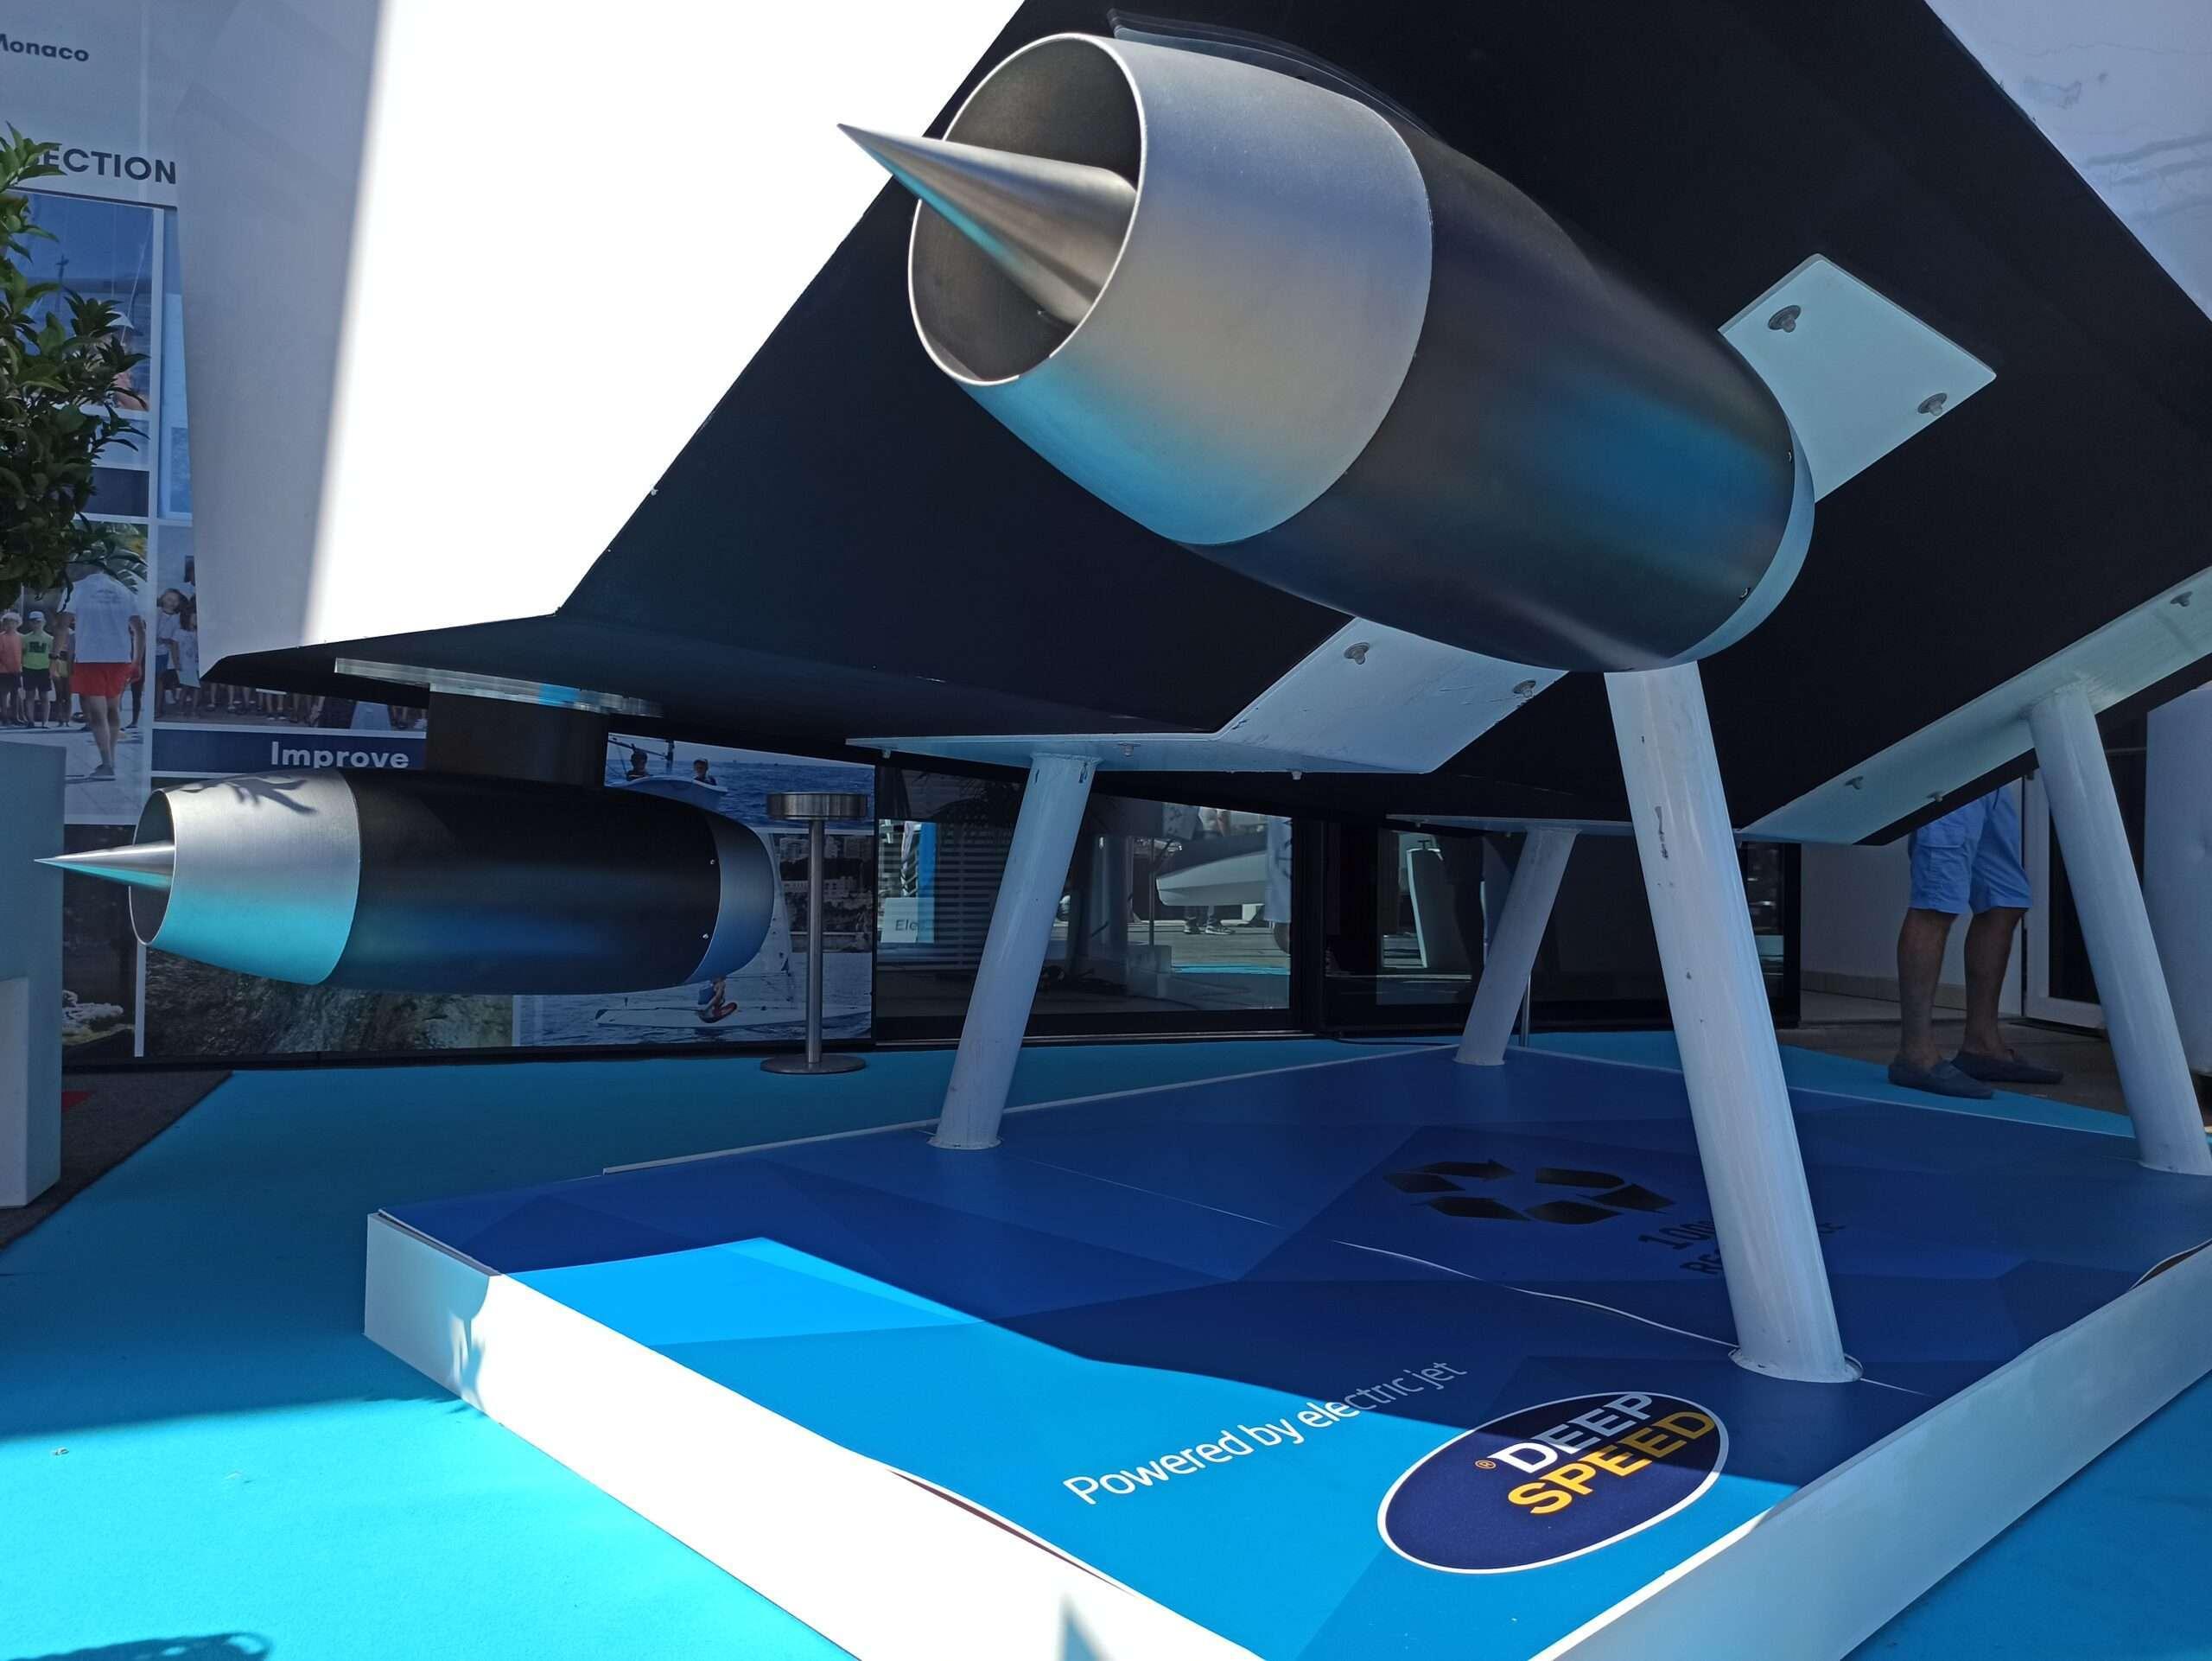 Sealence all'8° Monaco Energy Boat Challenge a fianco di Amer Yachts